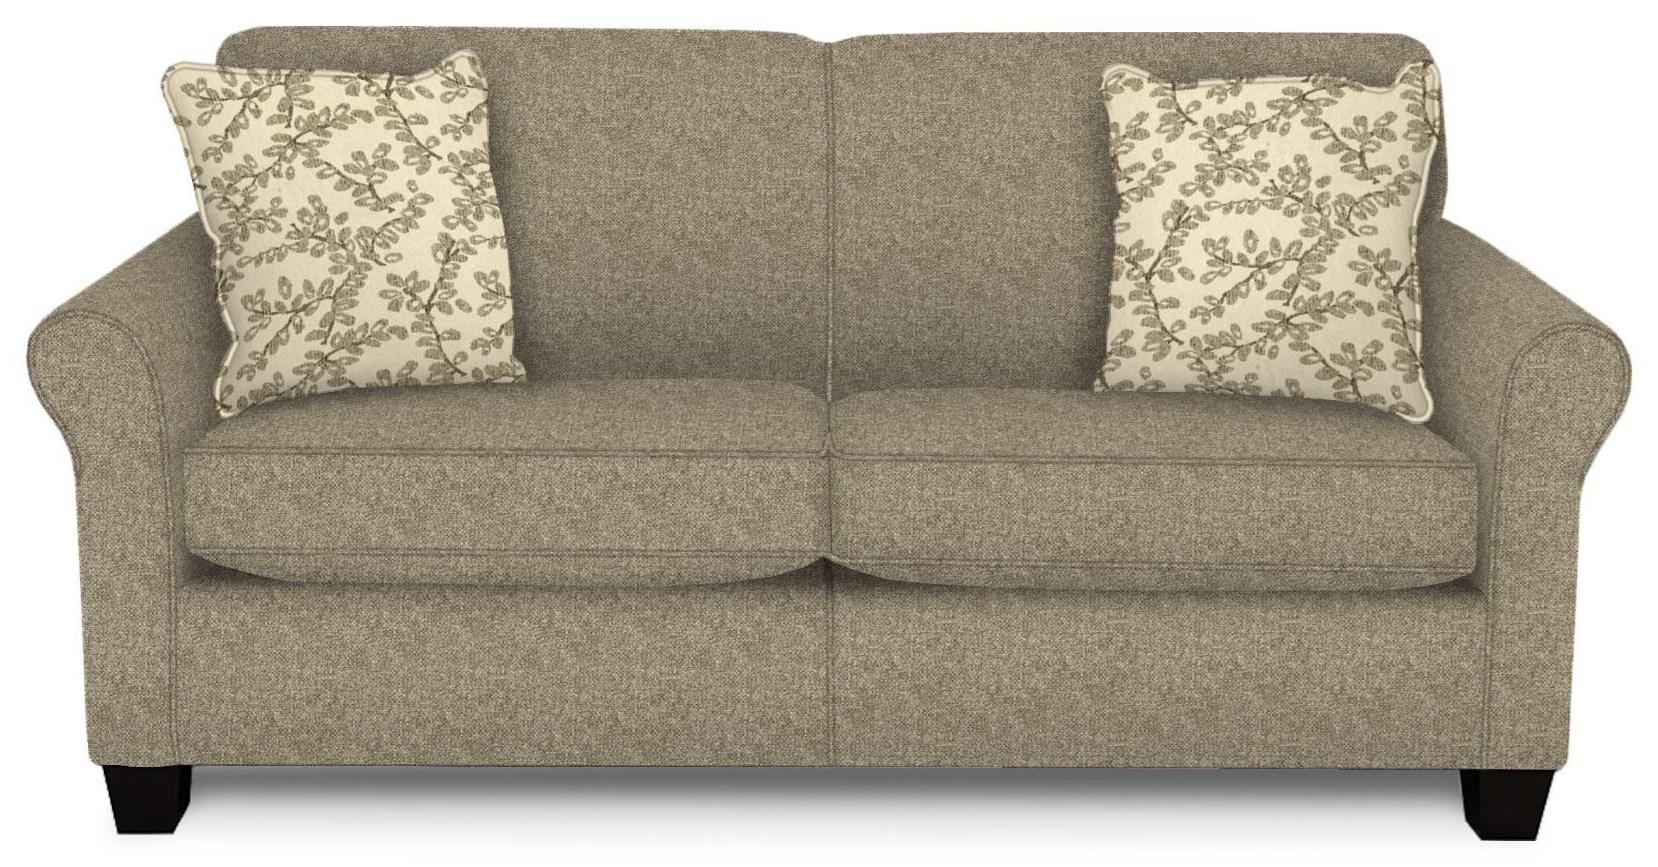 Damian Pepper Full Sleeper Sofa by England at Crowley Furniture & Mattress